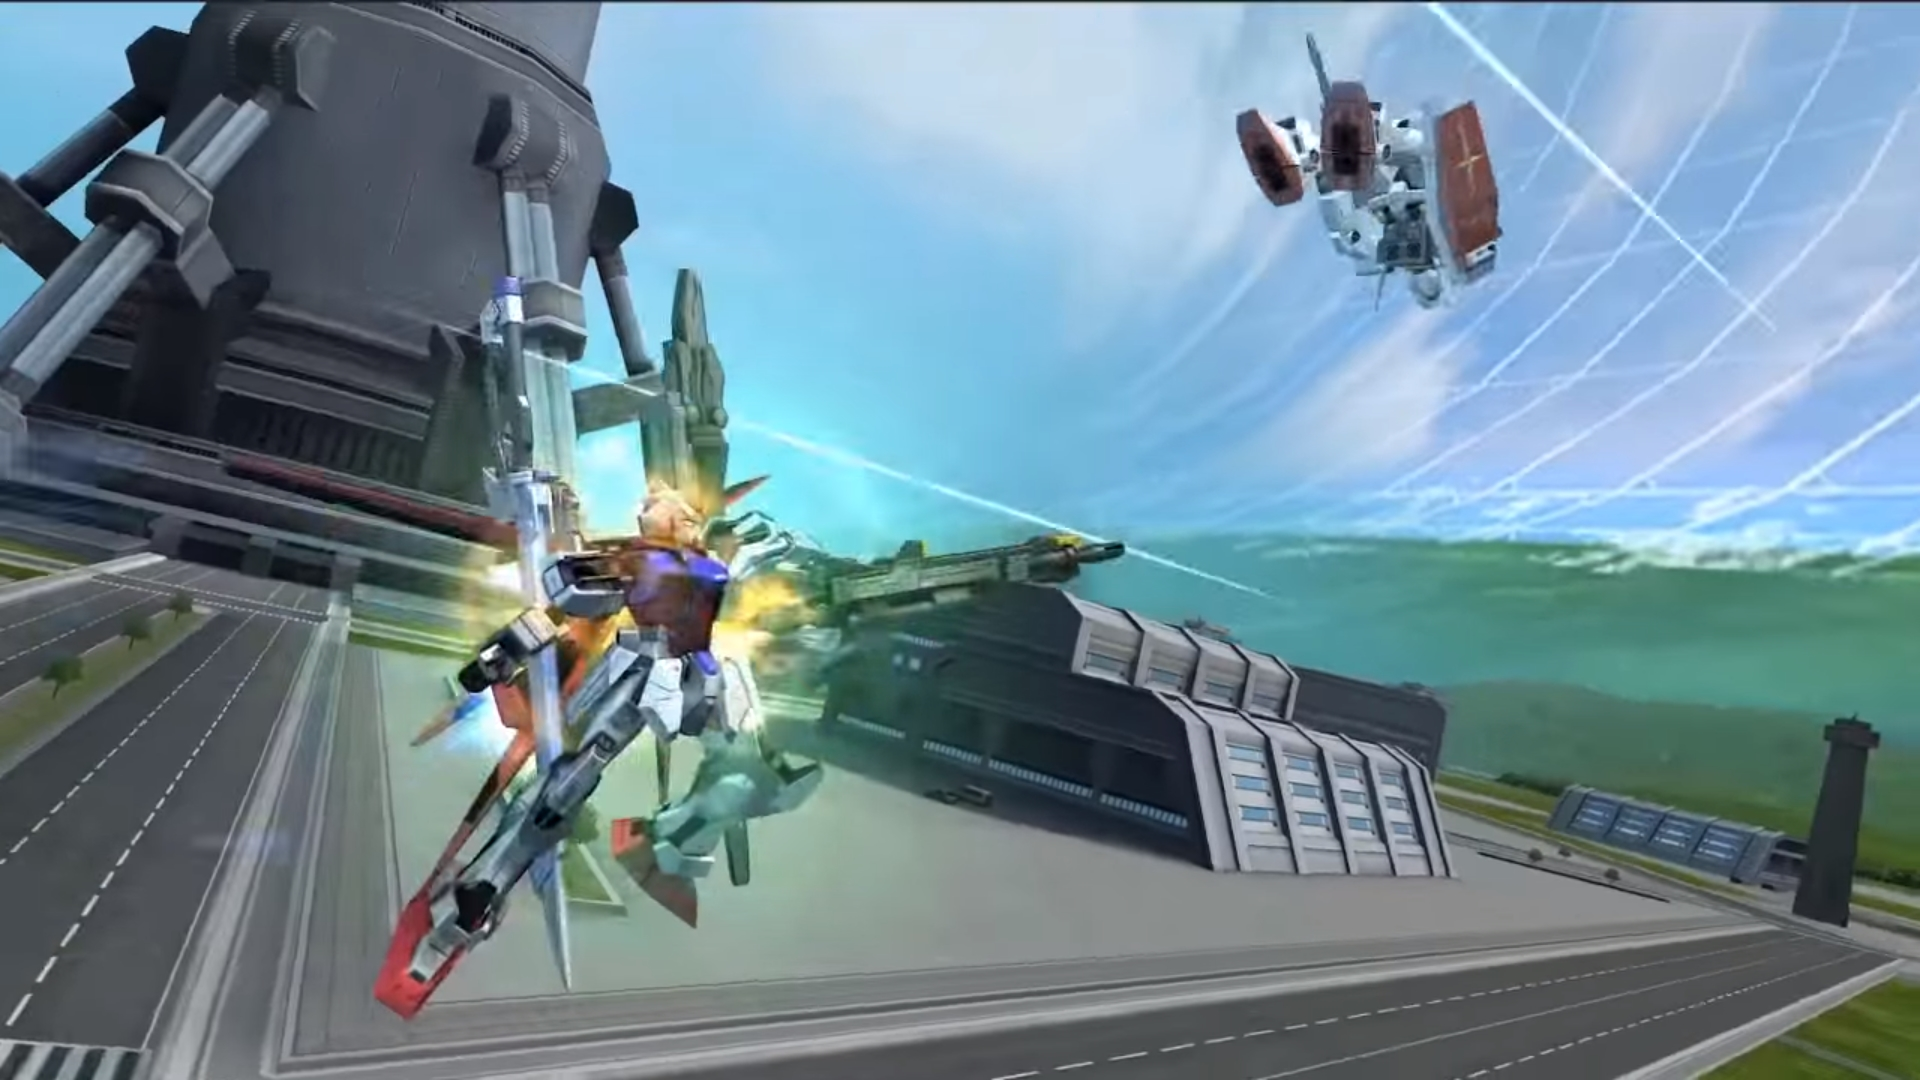 gundam battle 17102017 03